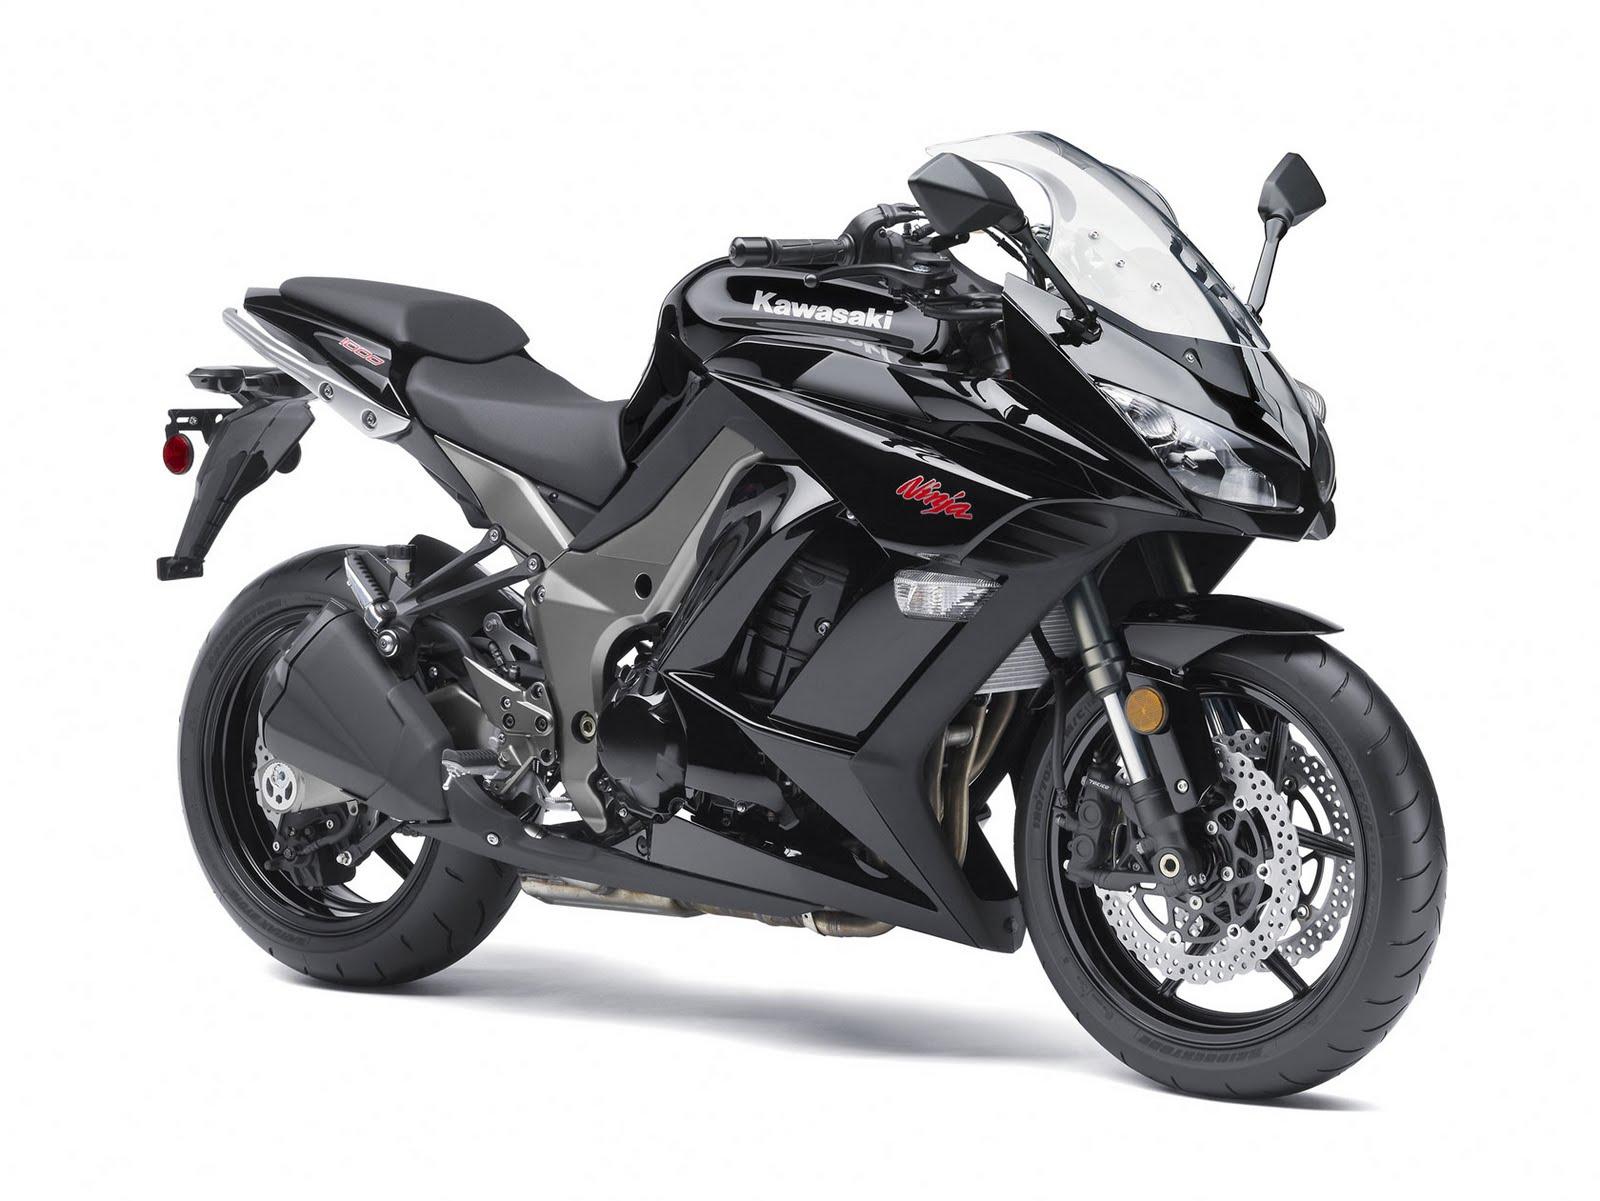 Motor Cycle Collections: New 2011 Kawasaki Ninja 1000 the ...